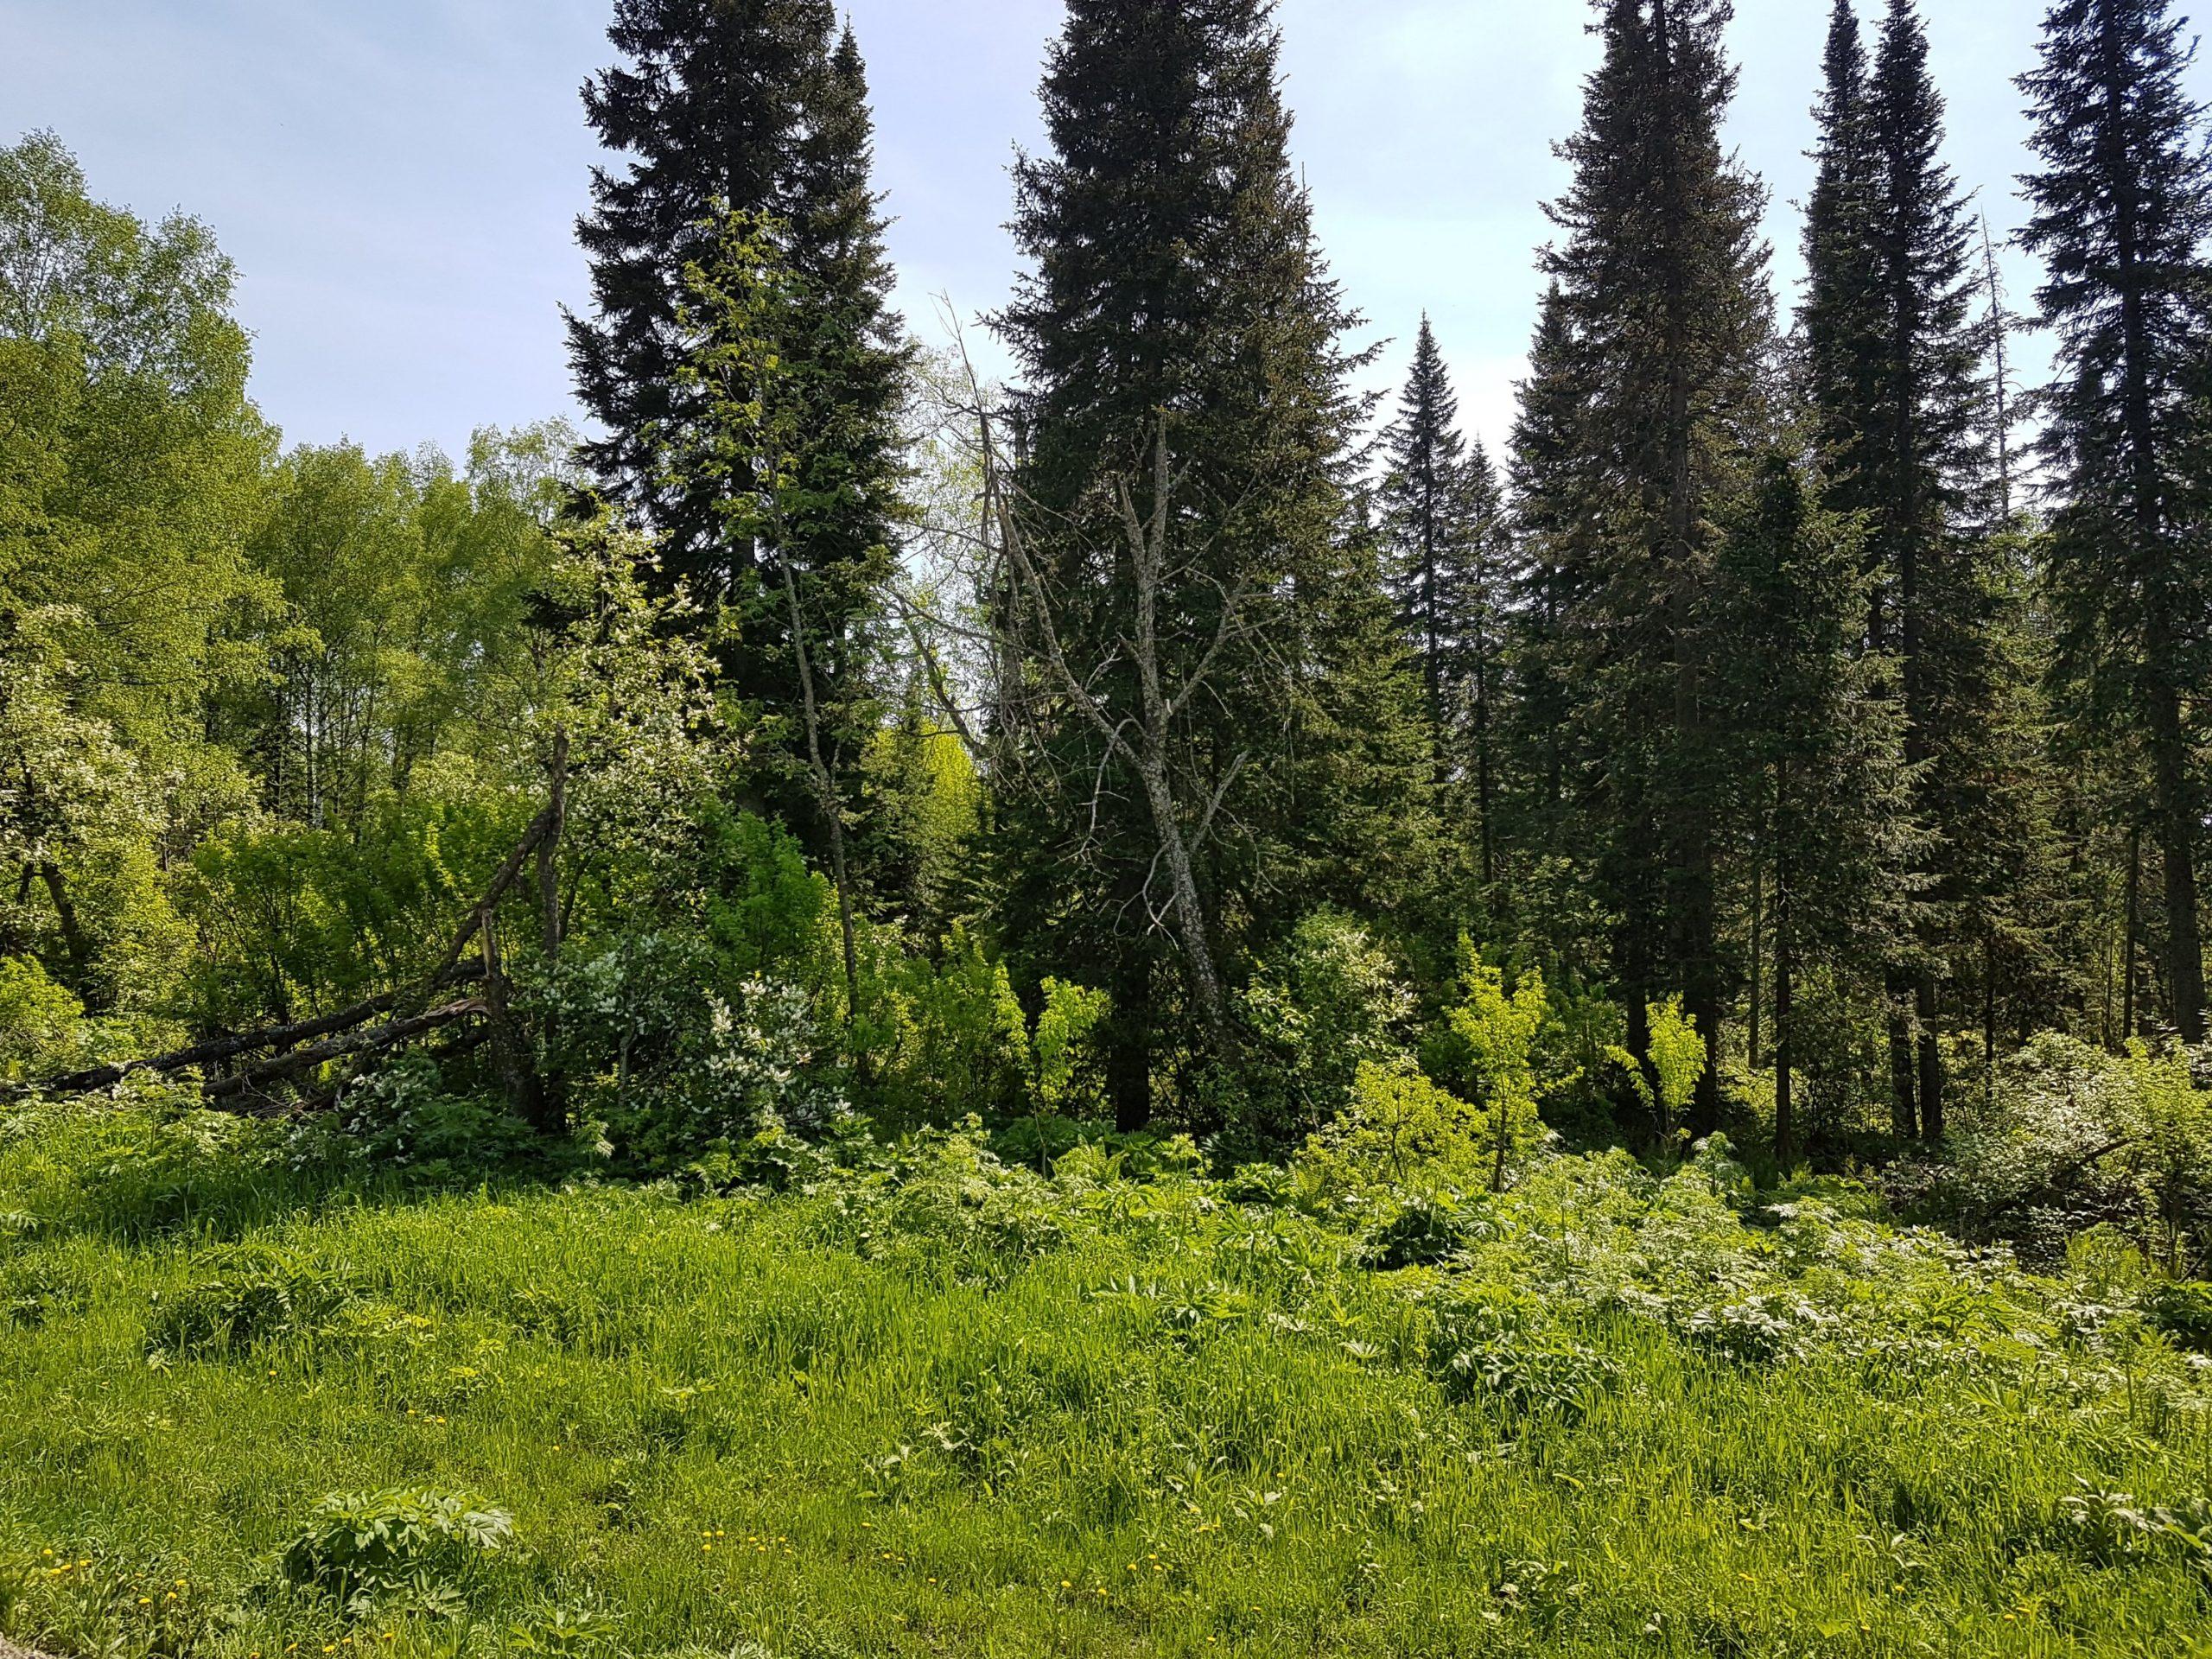 De Kemerovo à Irkoutsk - jours 1 à 3